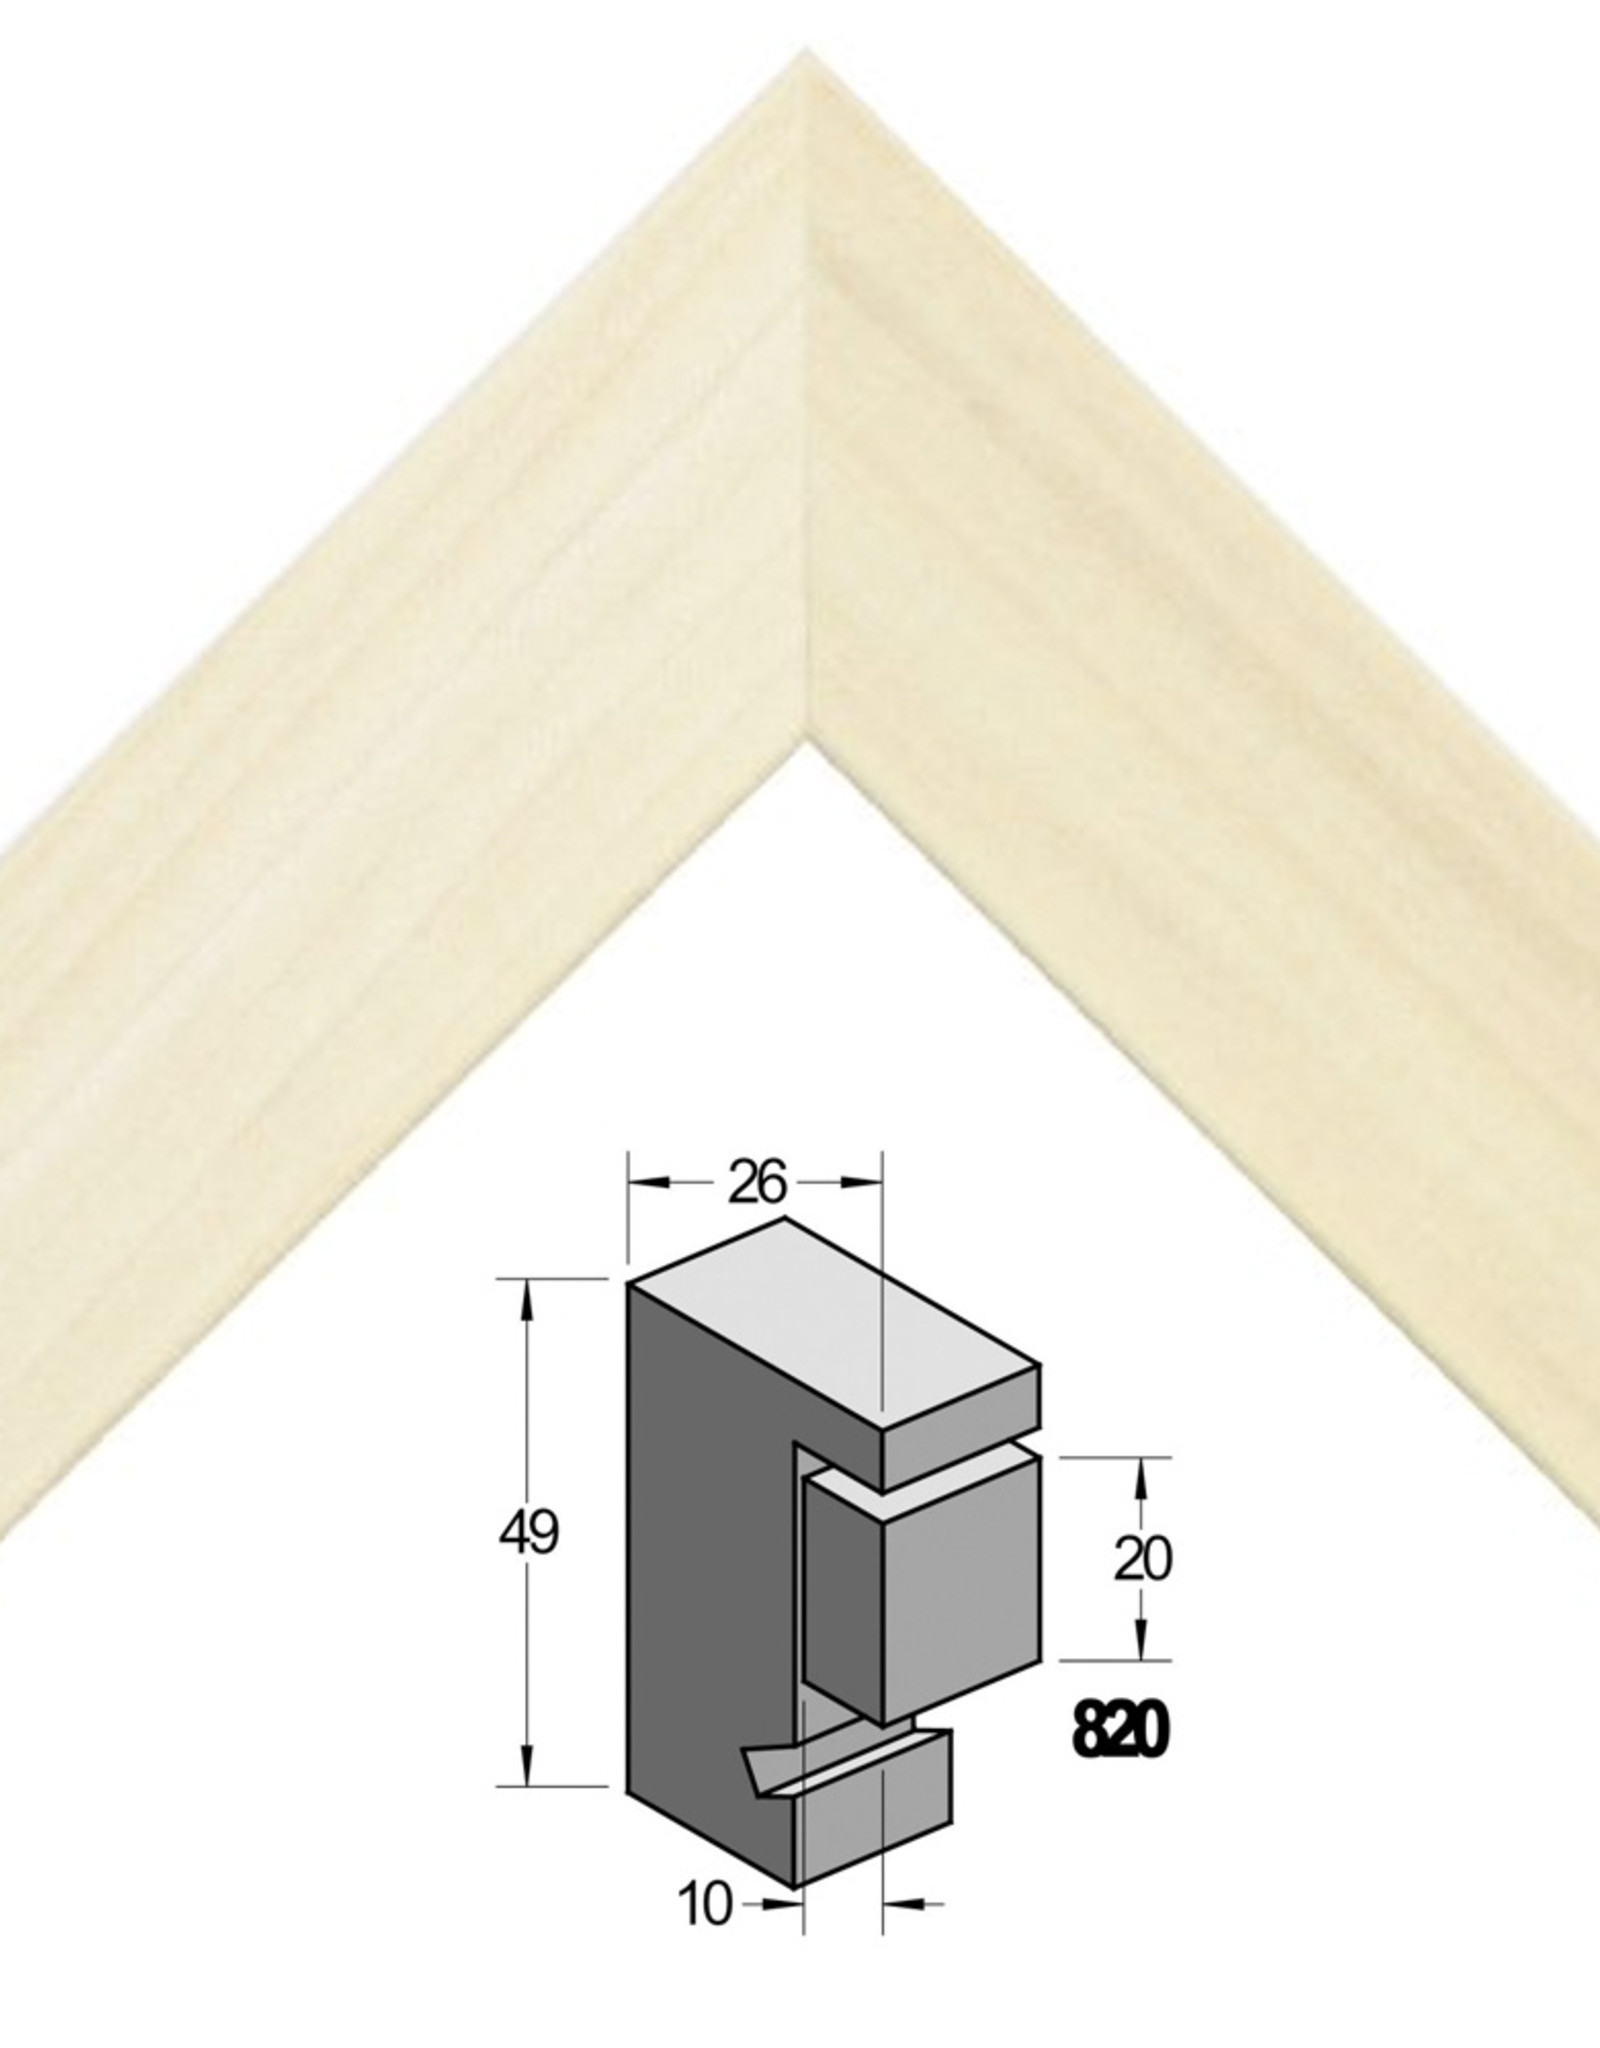 2x Wissellijst Verdiept 60x80cm Populier Ongelakt Barth profiel 26x49mm(220) sponning 20mm